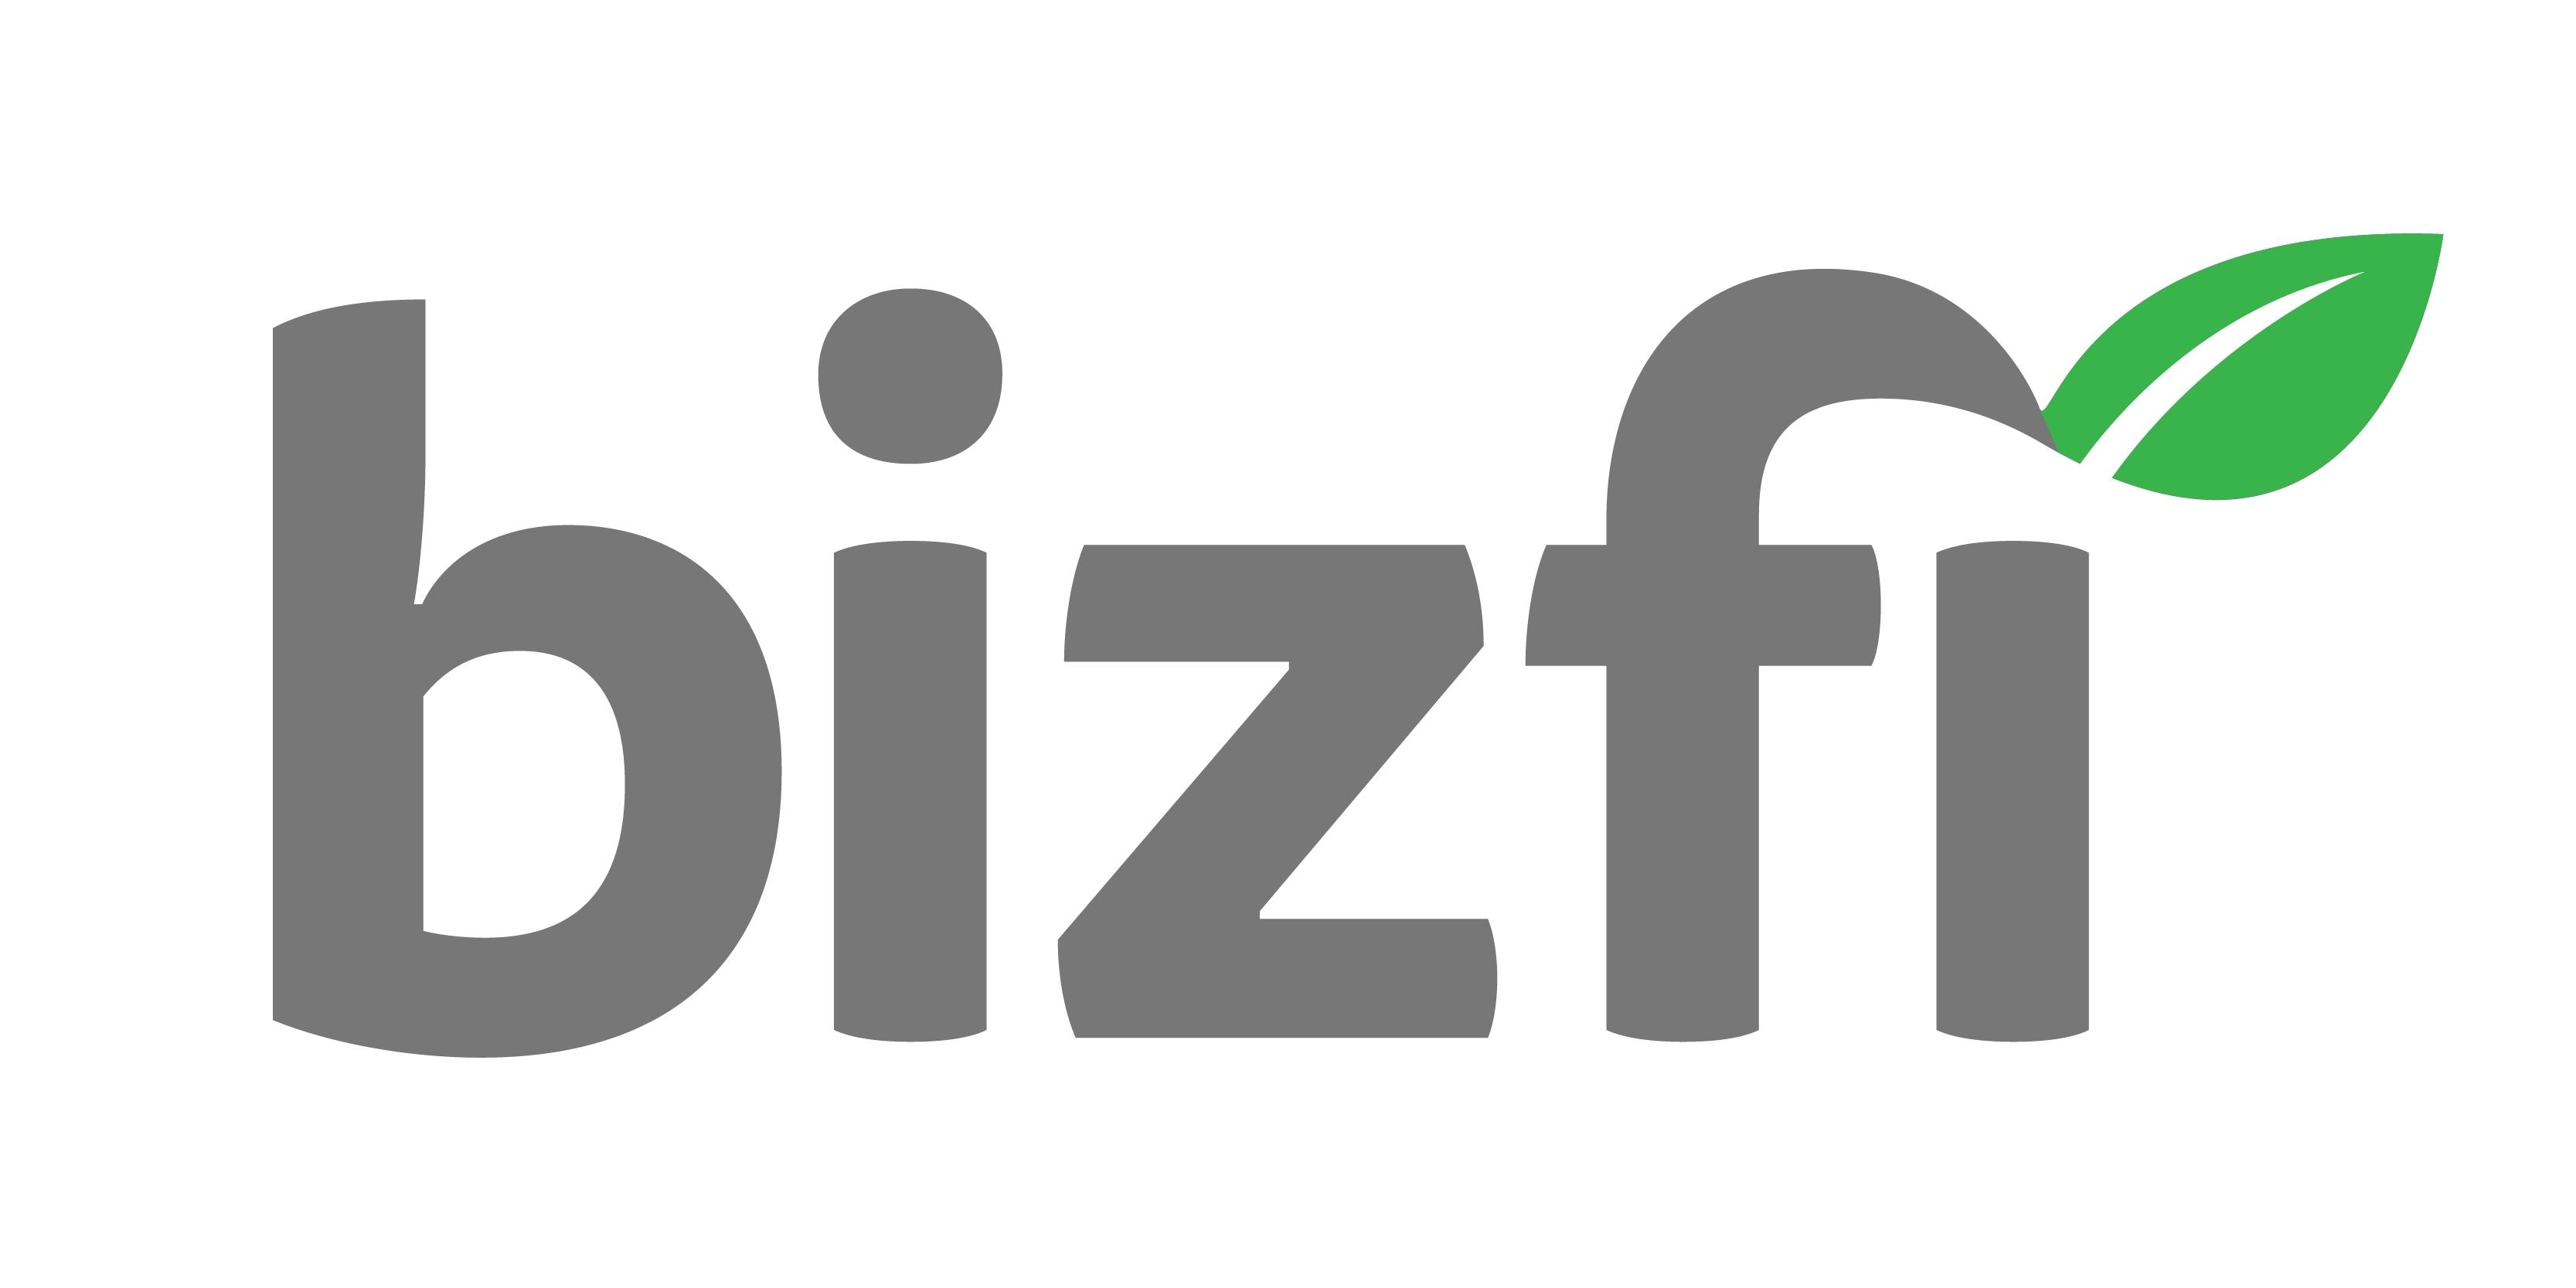 Bizfi Appoints Alternative Finance and Payments Veteran John Donovan as CEO